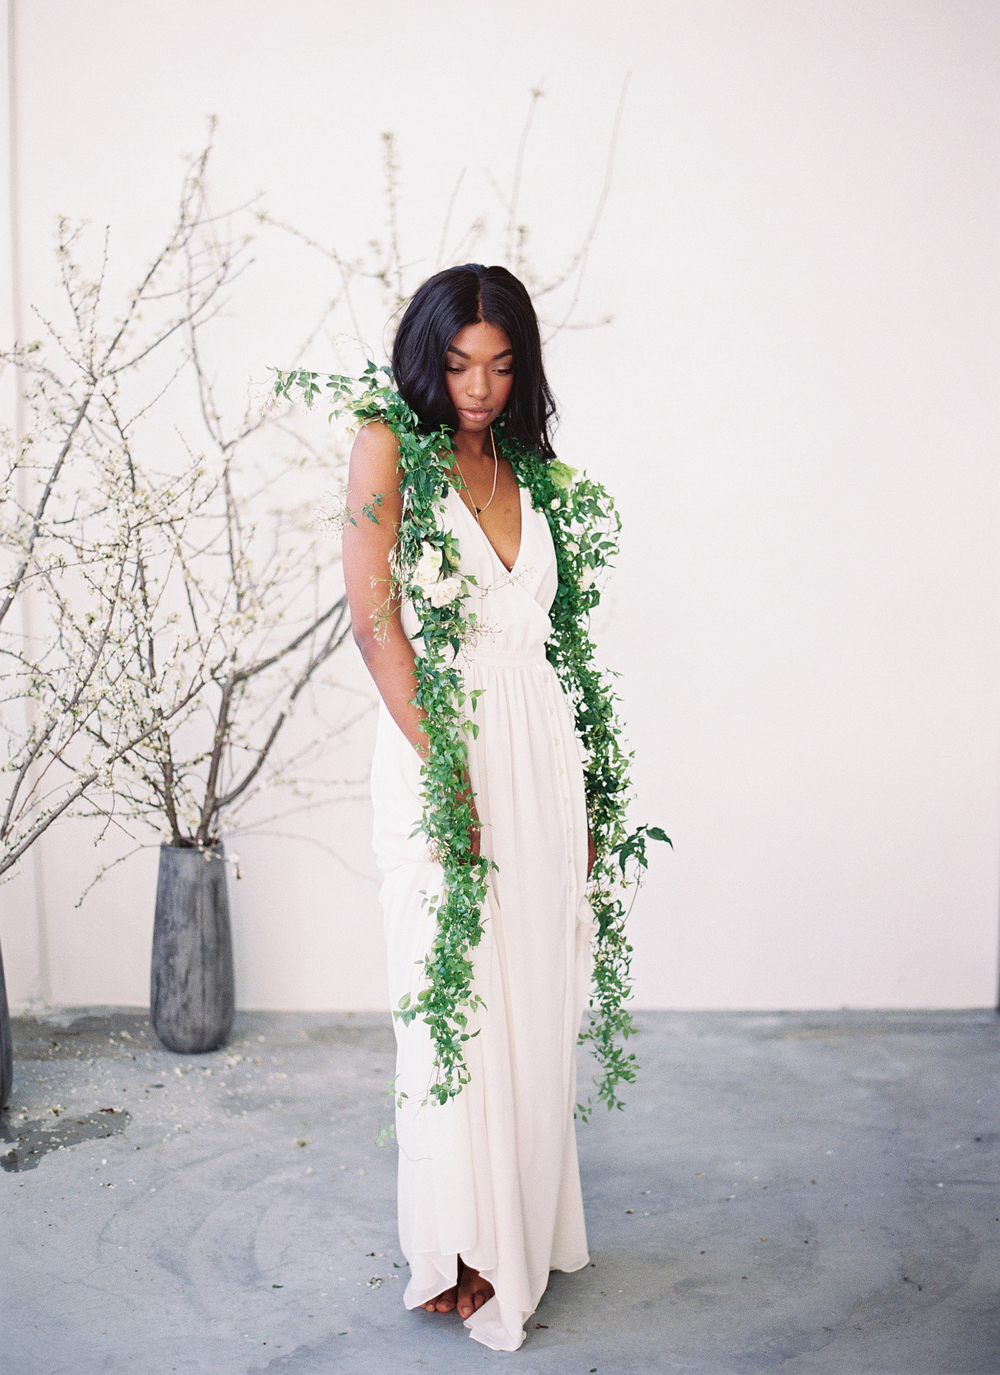 Floralessence-Esmeraldafranco-55.JPG